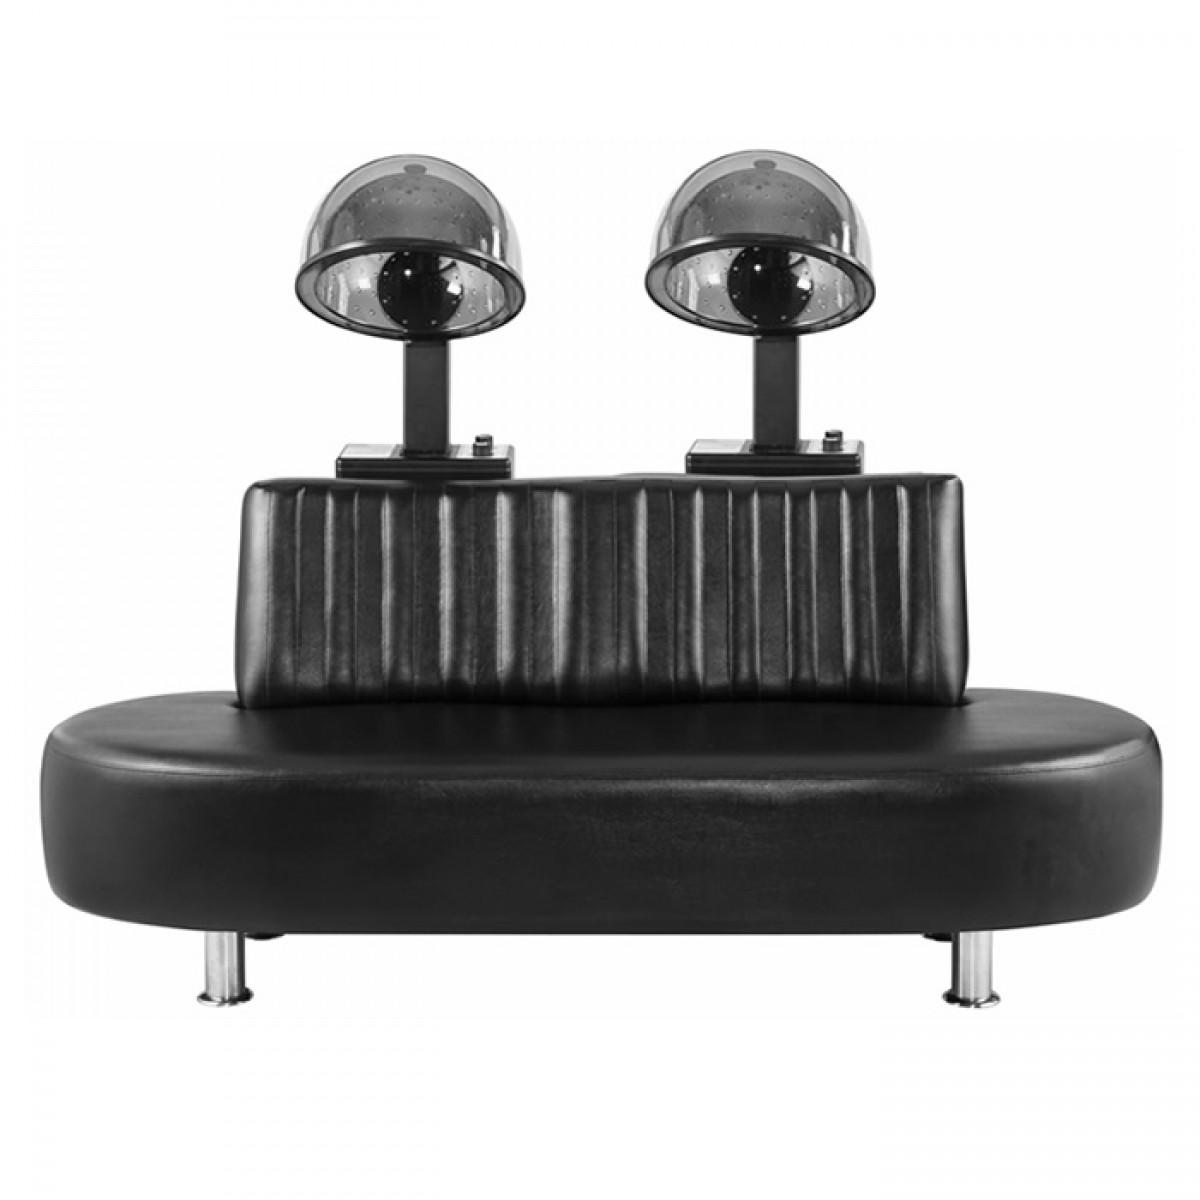 dryer chairs salon santa hat chair covers ebay quotbatllo quot